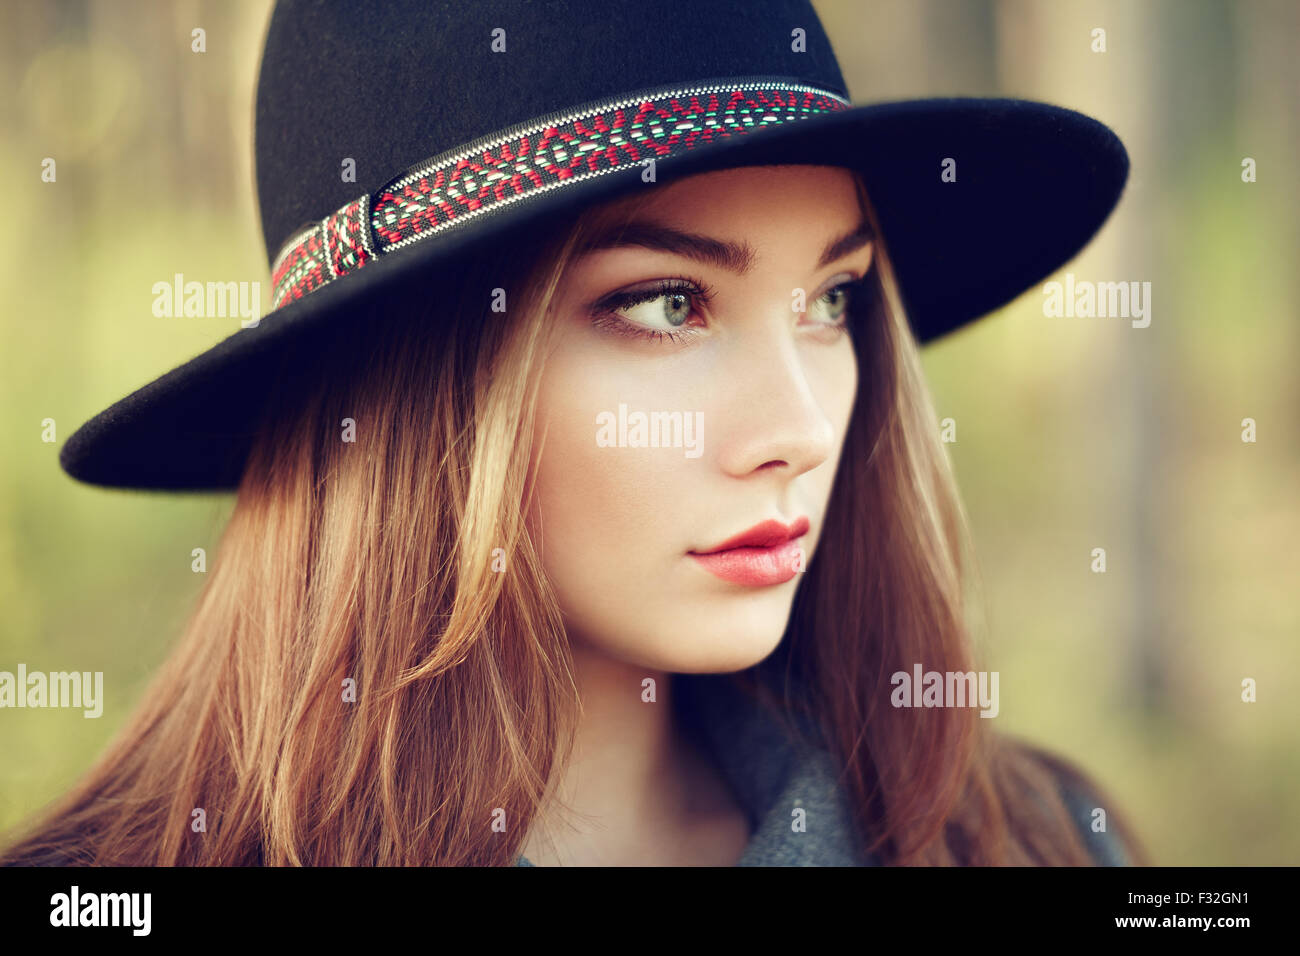 Retrato de joven mujer hermosa en otoño de abrigo. Niña de sombrero. Fotografía de moda Imagen De Stock